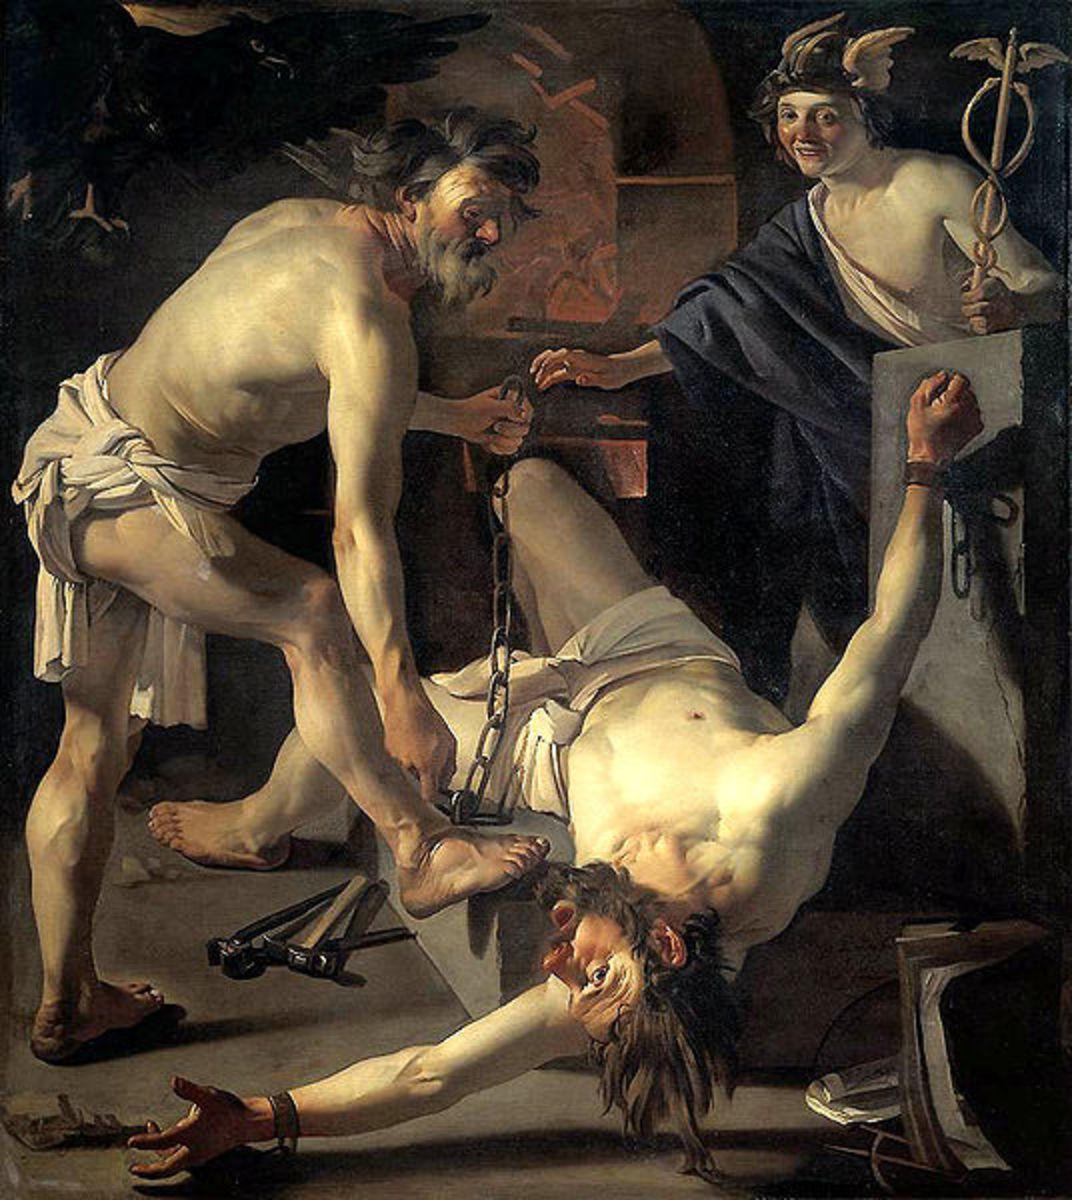 Prometheus Being Chained by Vulcan, Dirck van Babur, 1623